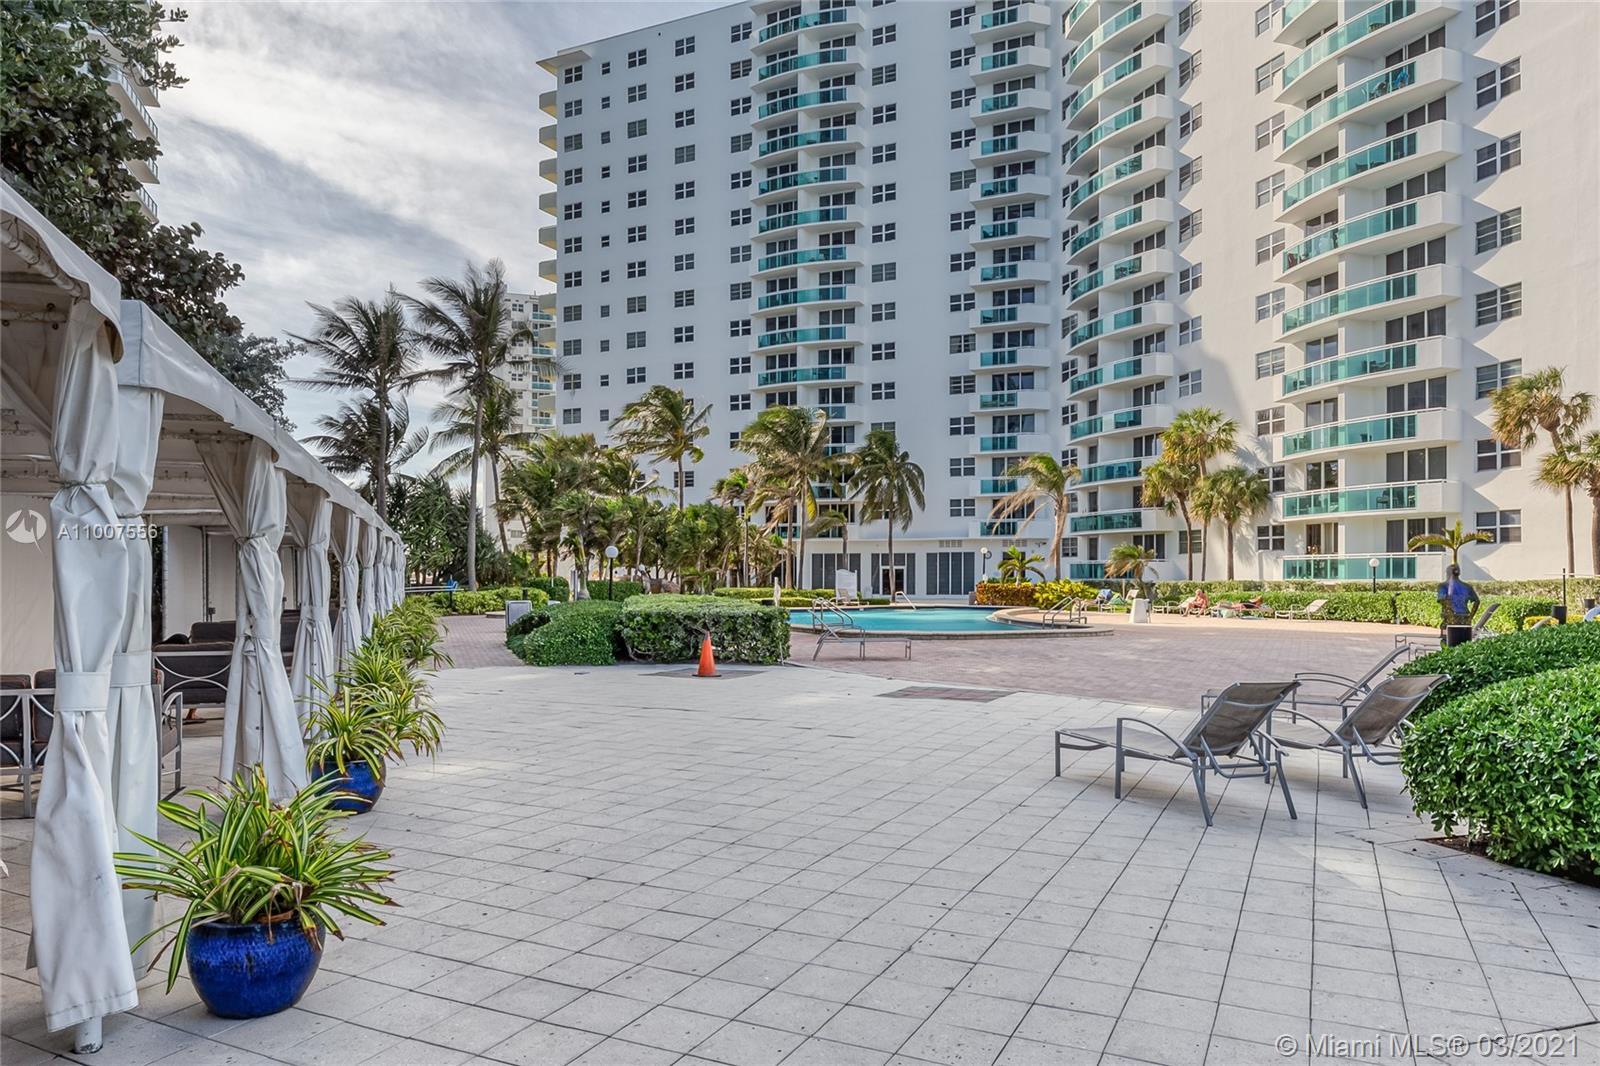 The Residences On Hollywood Beach image #28